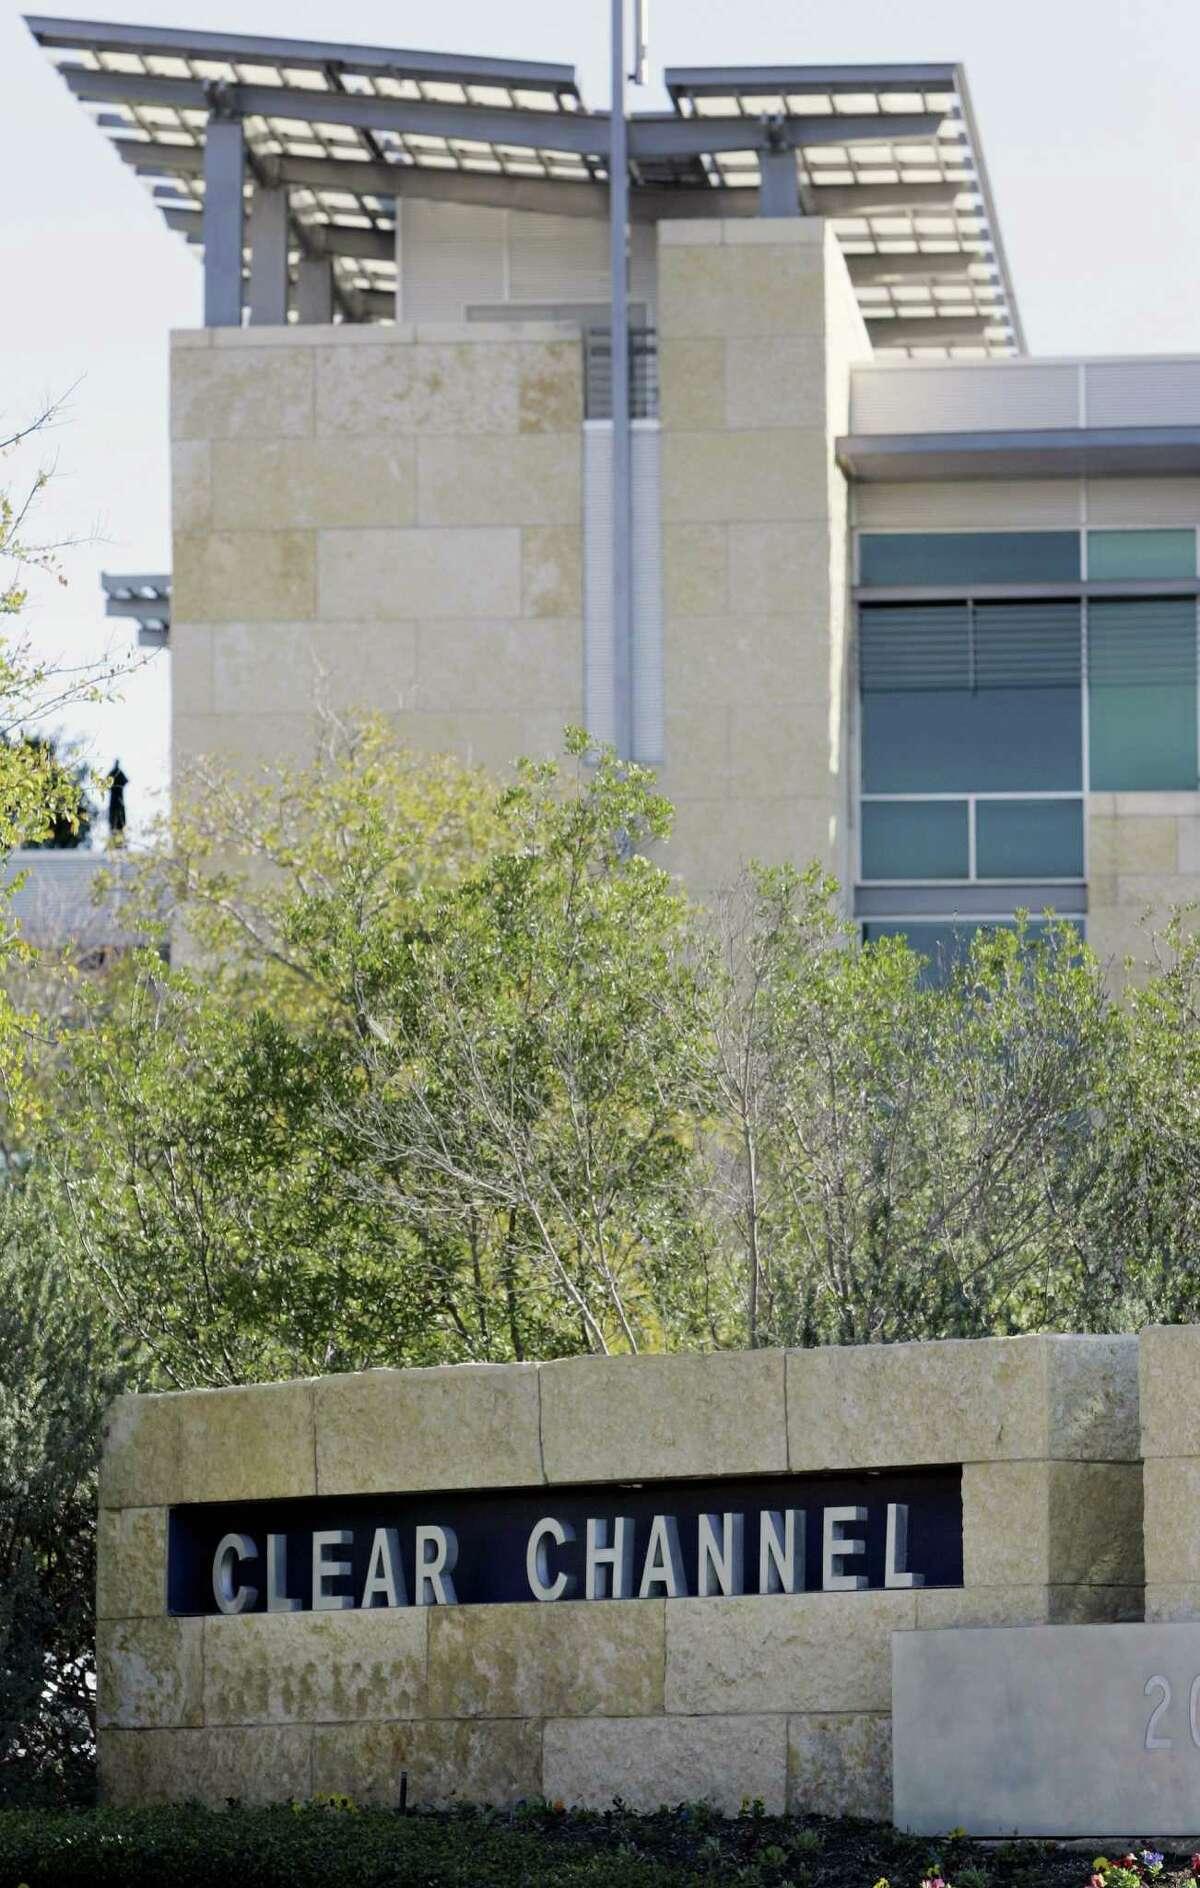 Revenue rose 3 percent to $1.7 billion in the fourth quarter.